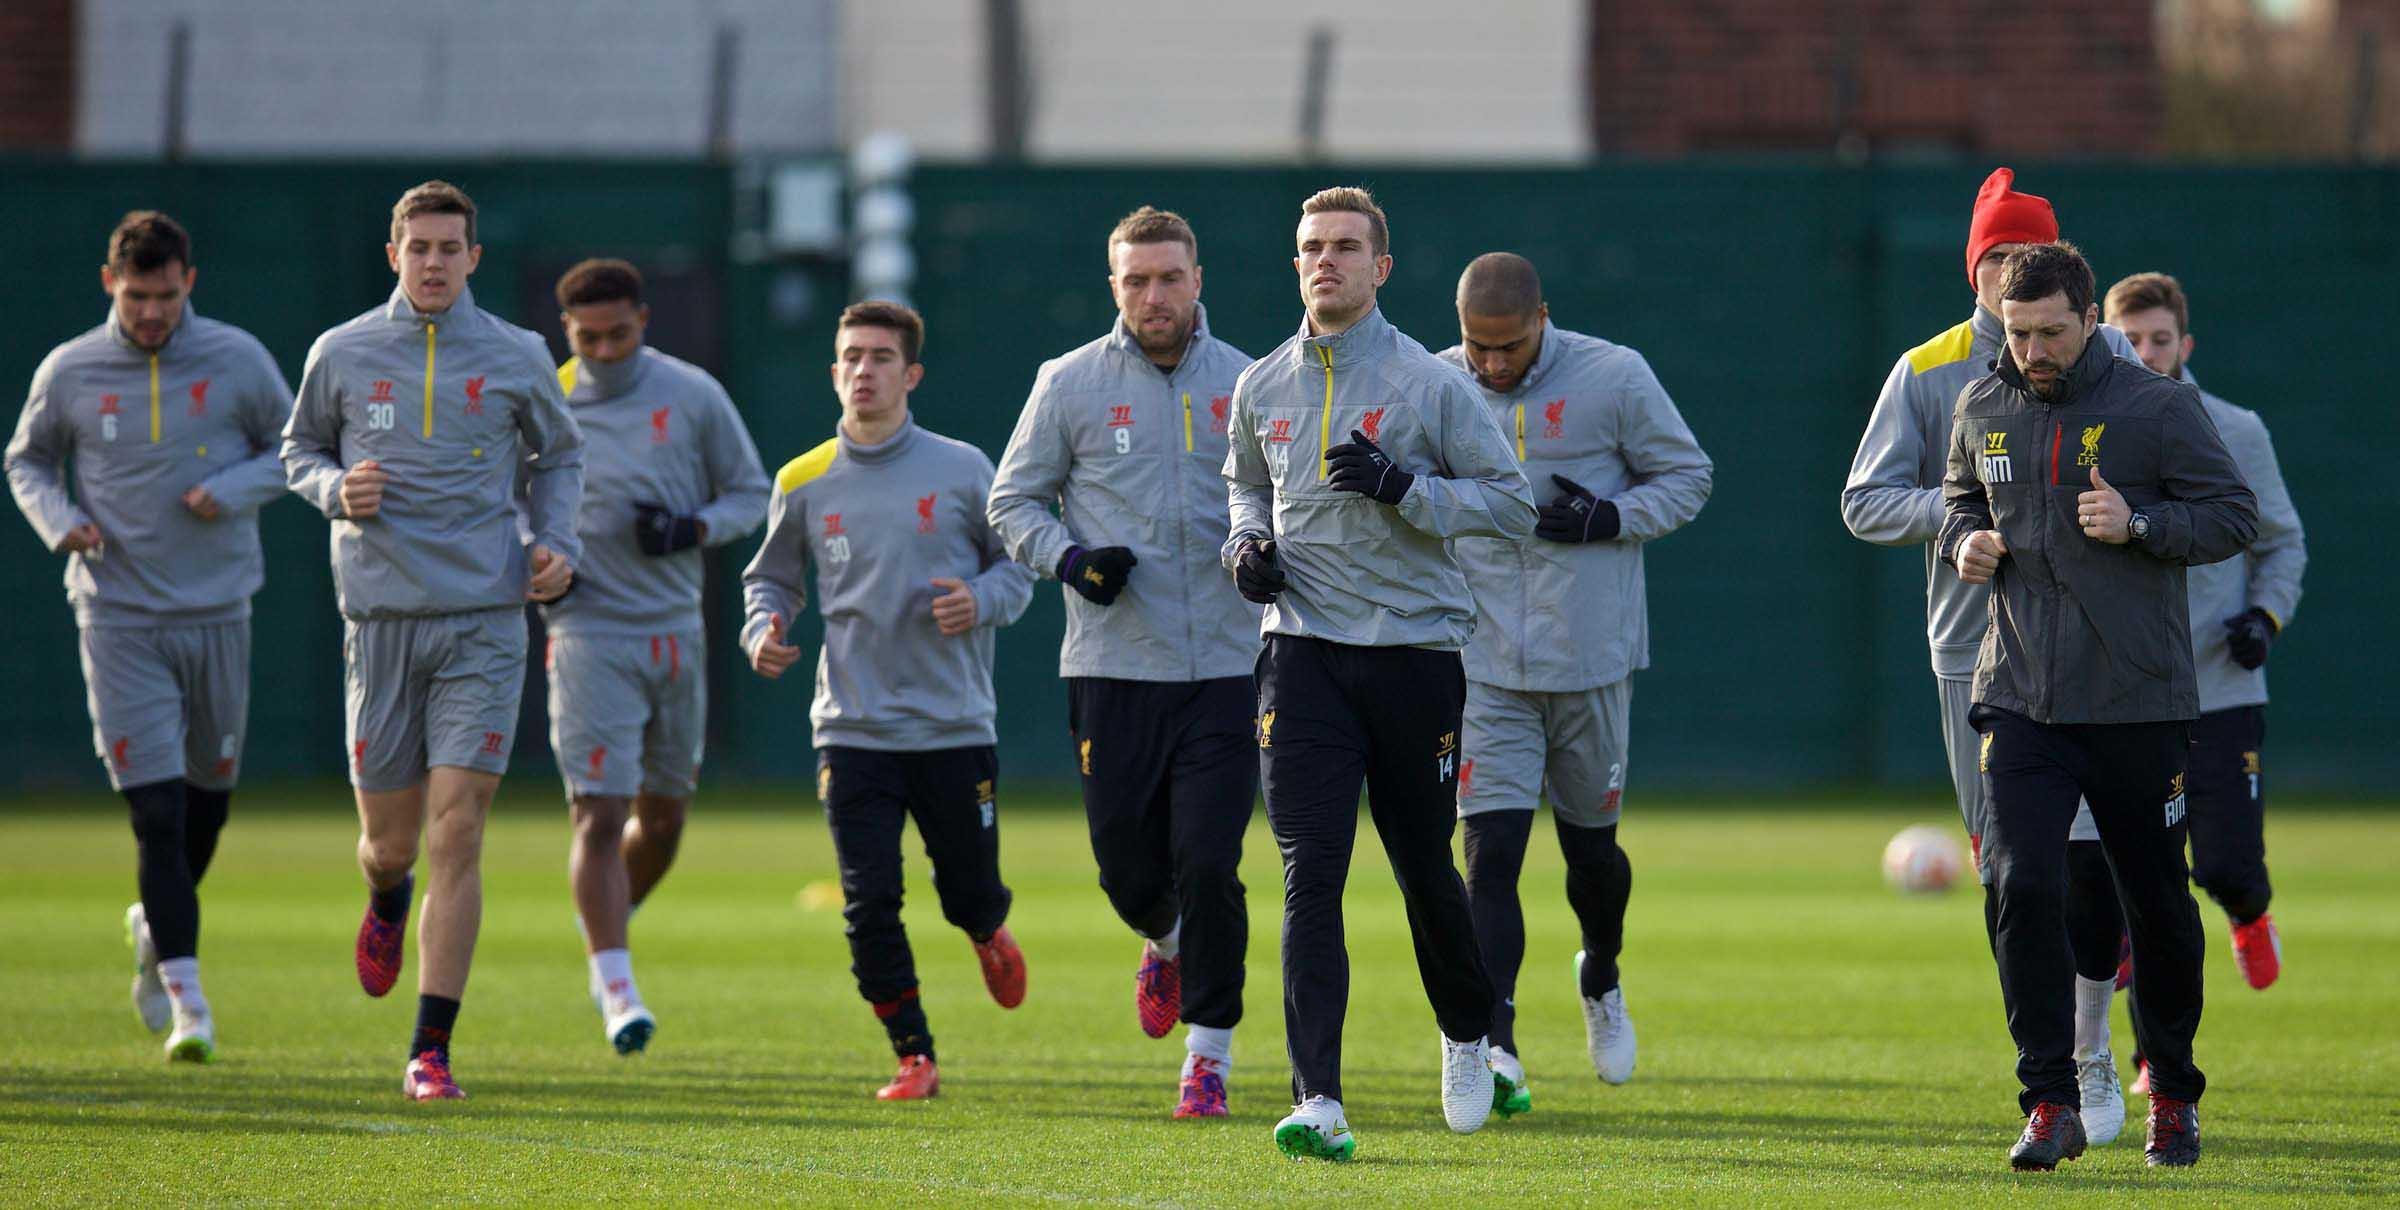 European Football - UEFA Europa League - Round of 32 - Liverpool FC v Besiktas JK